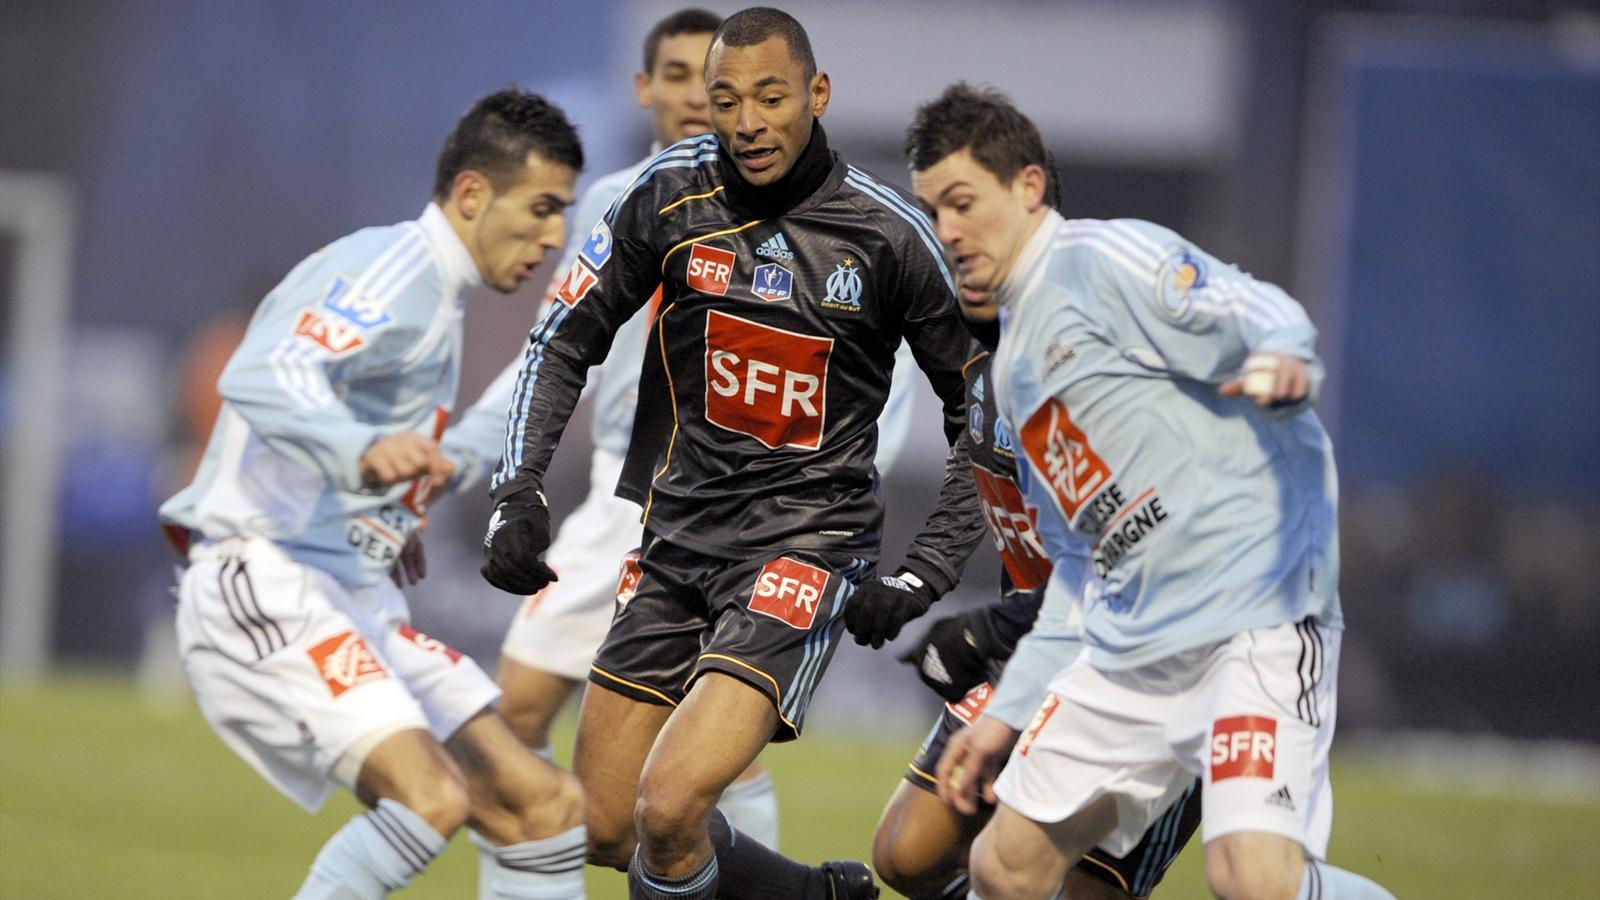 2010 2016 six ans apr s tr lissac retrouve l 39 om en - Resultats coupe de france football 2015 ...